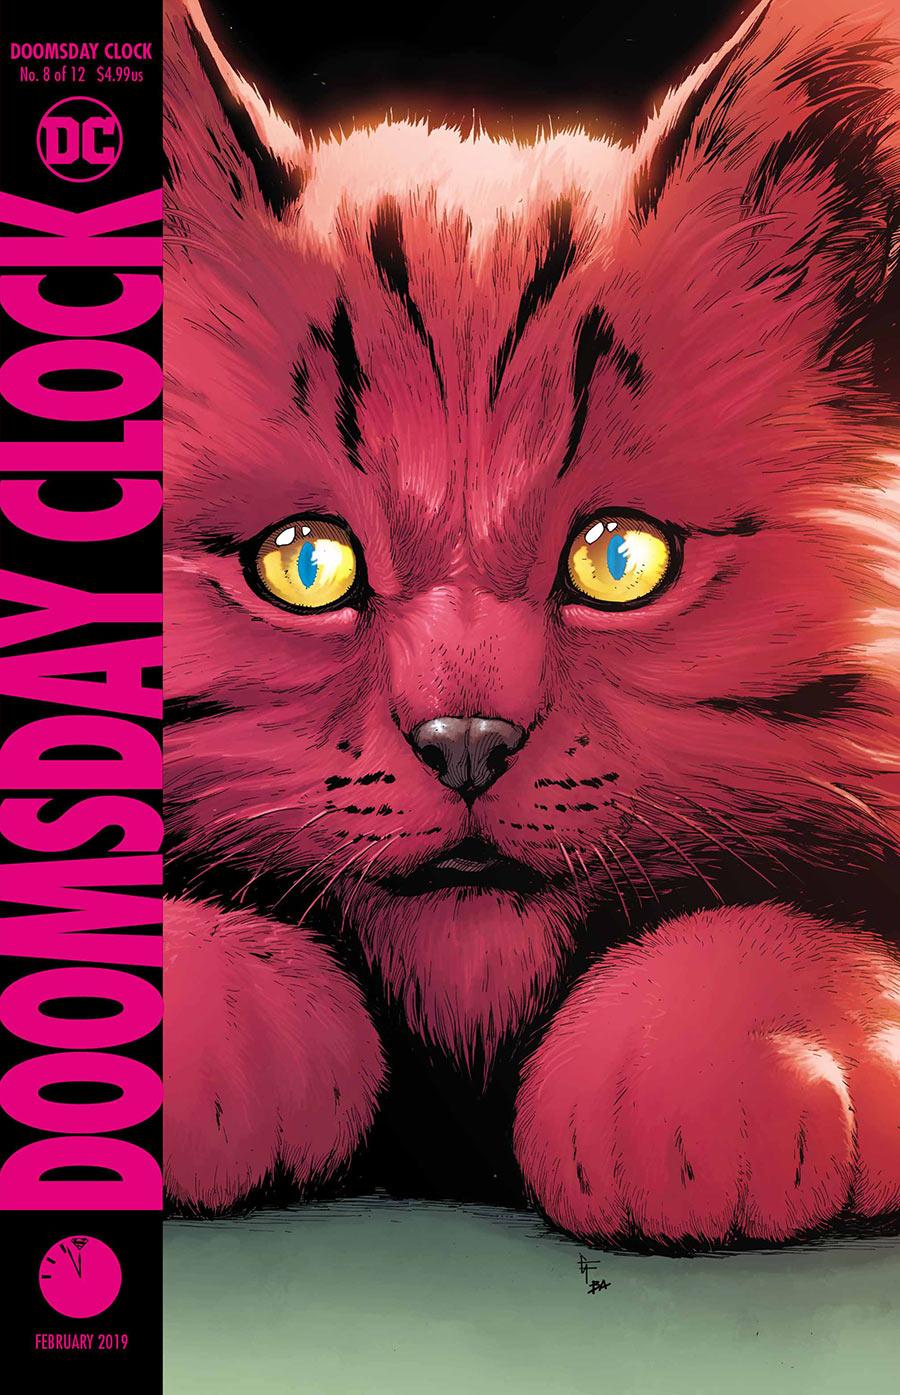 Doomsday Clock 8 - Cover 1 - DC Comics News